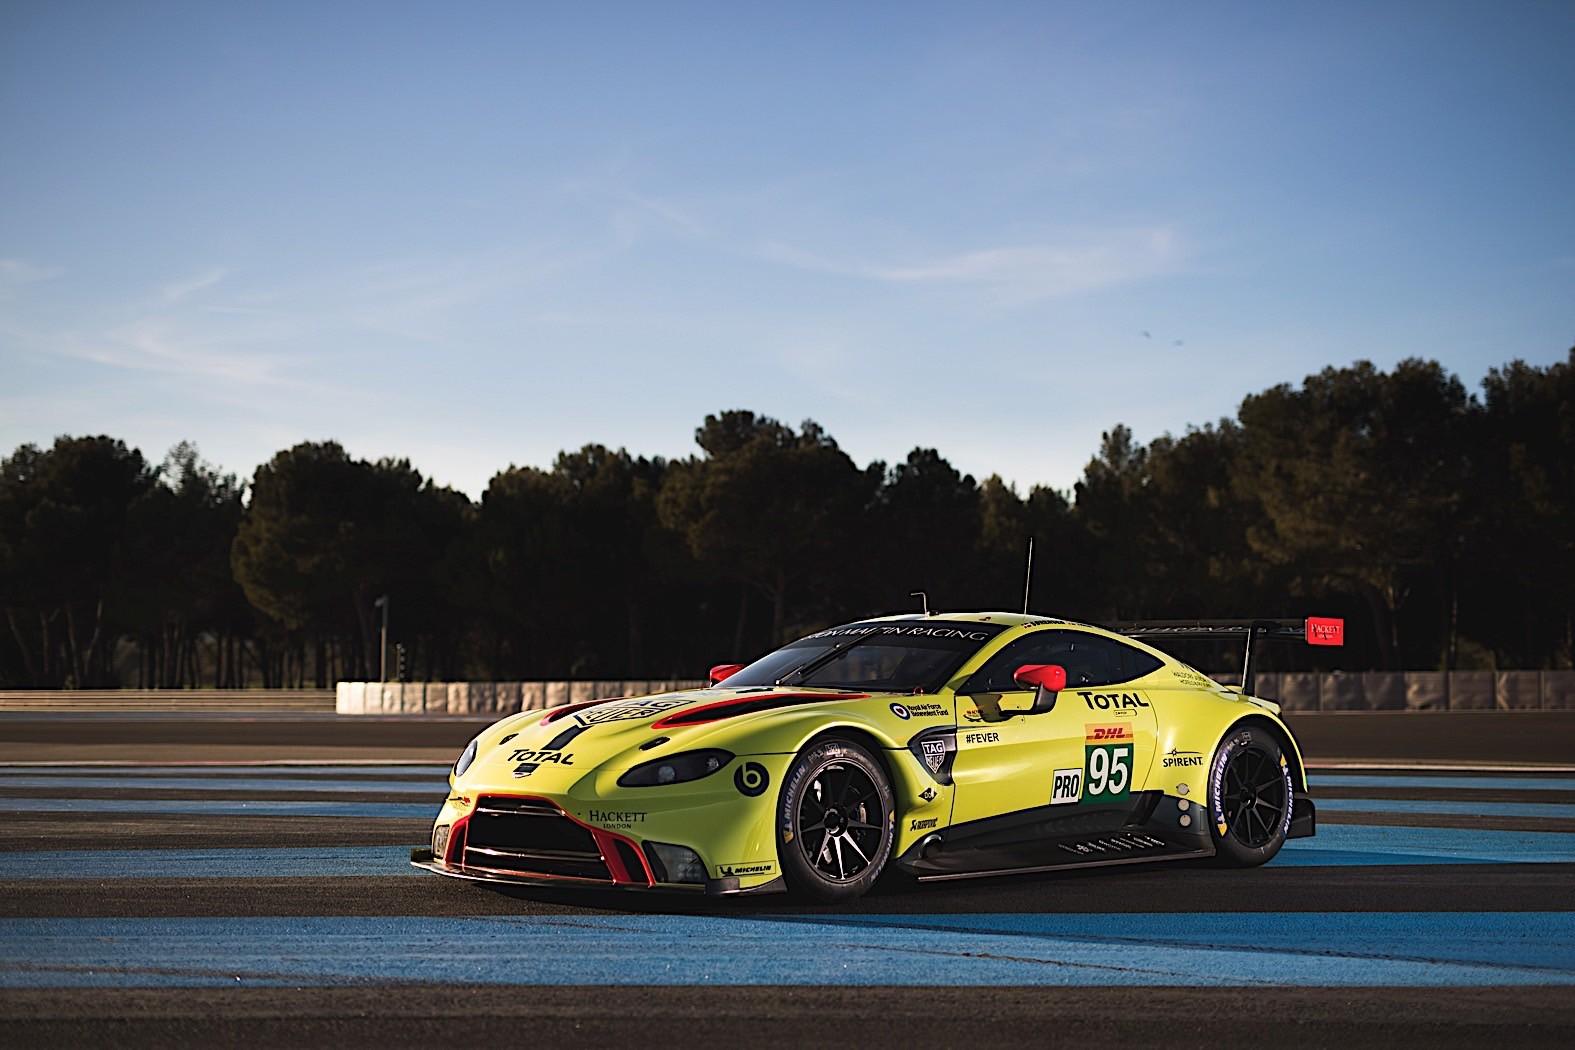 Aston_Martin_Vantage_GTE_0002